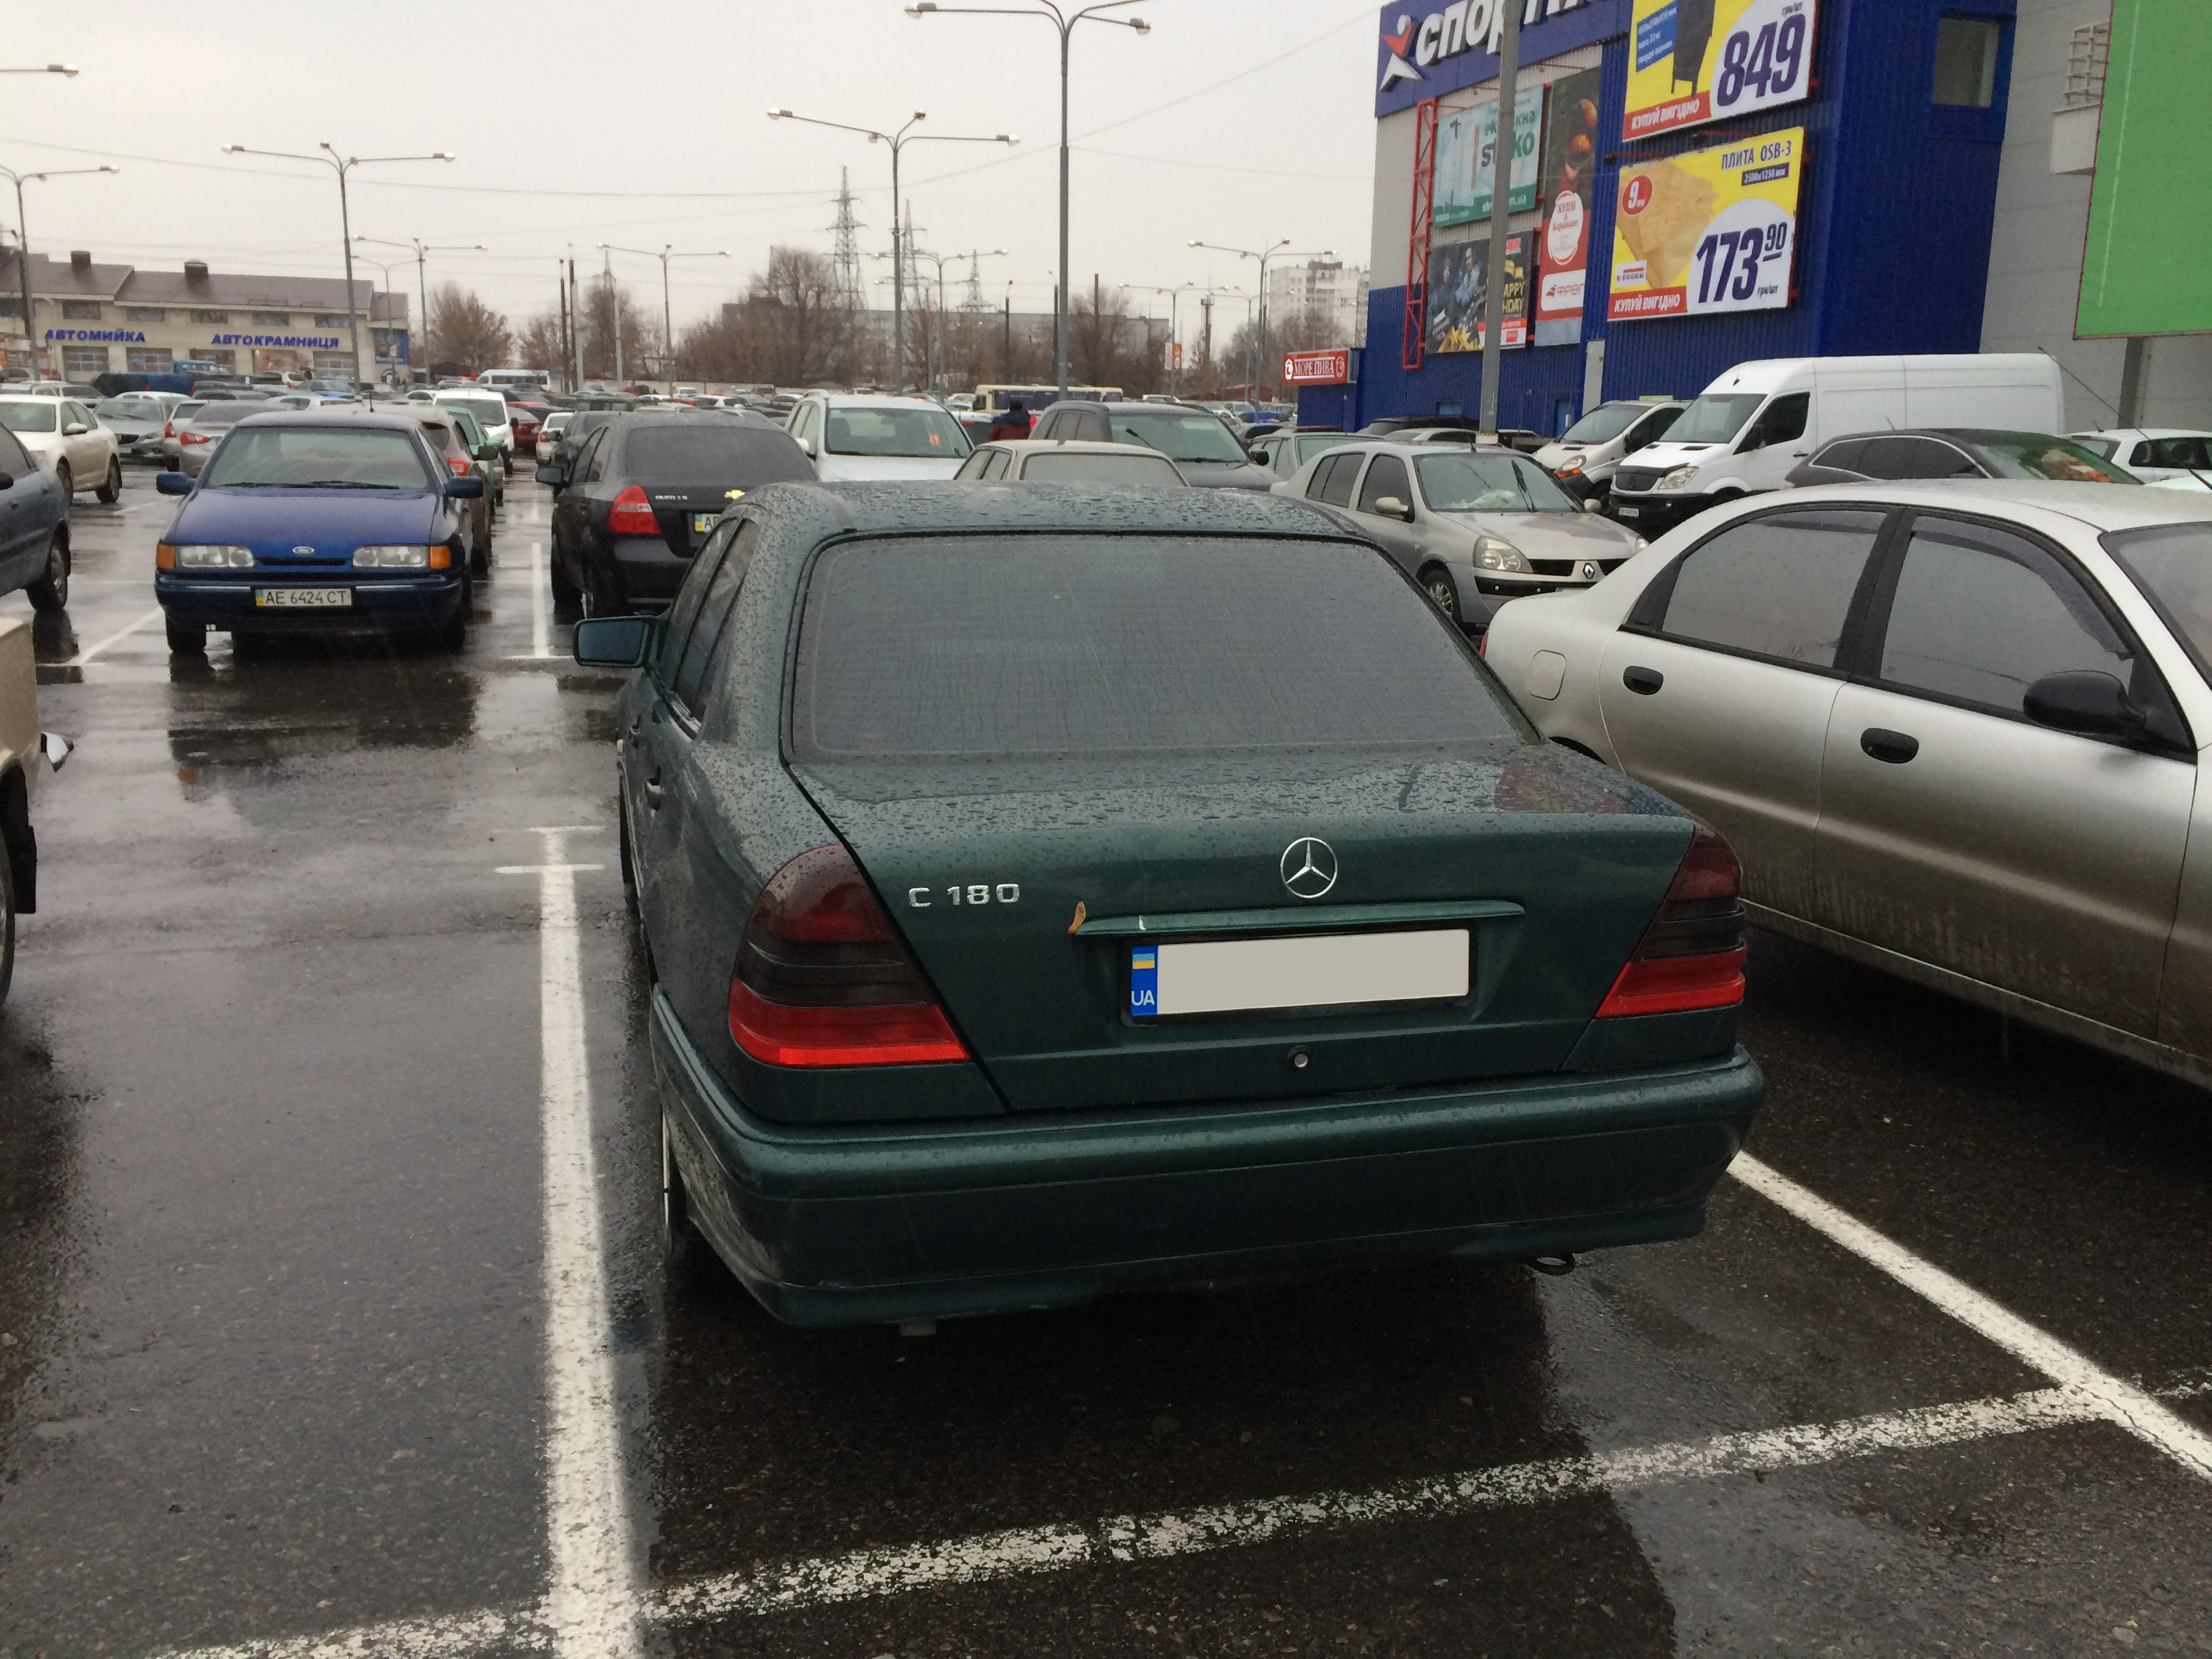 Фото 8 - Mercedes-Benz c180 w202 стоит ГБО 4 поколения! ГАЗ Пропан-бутан